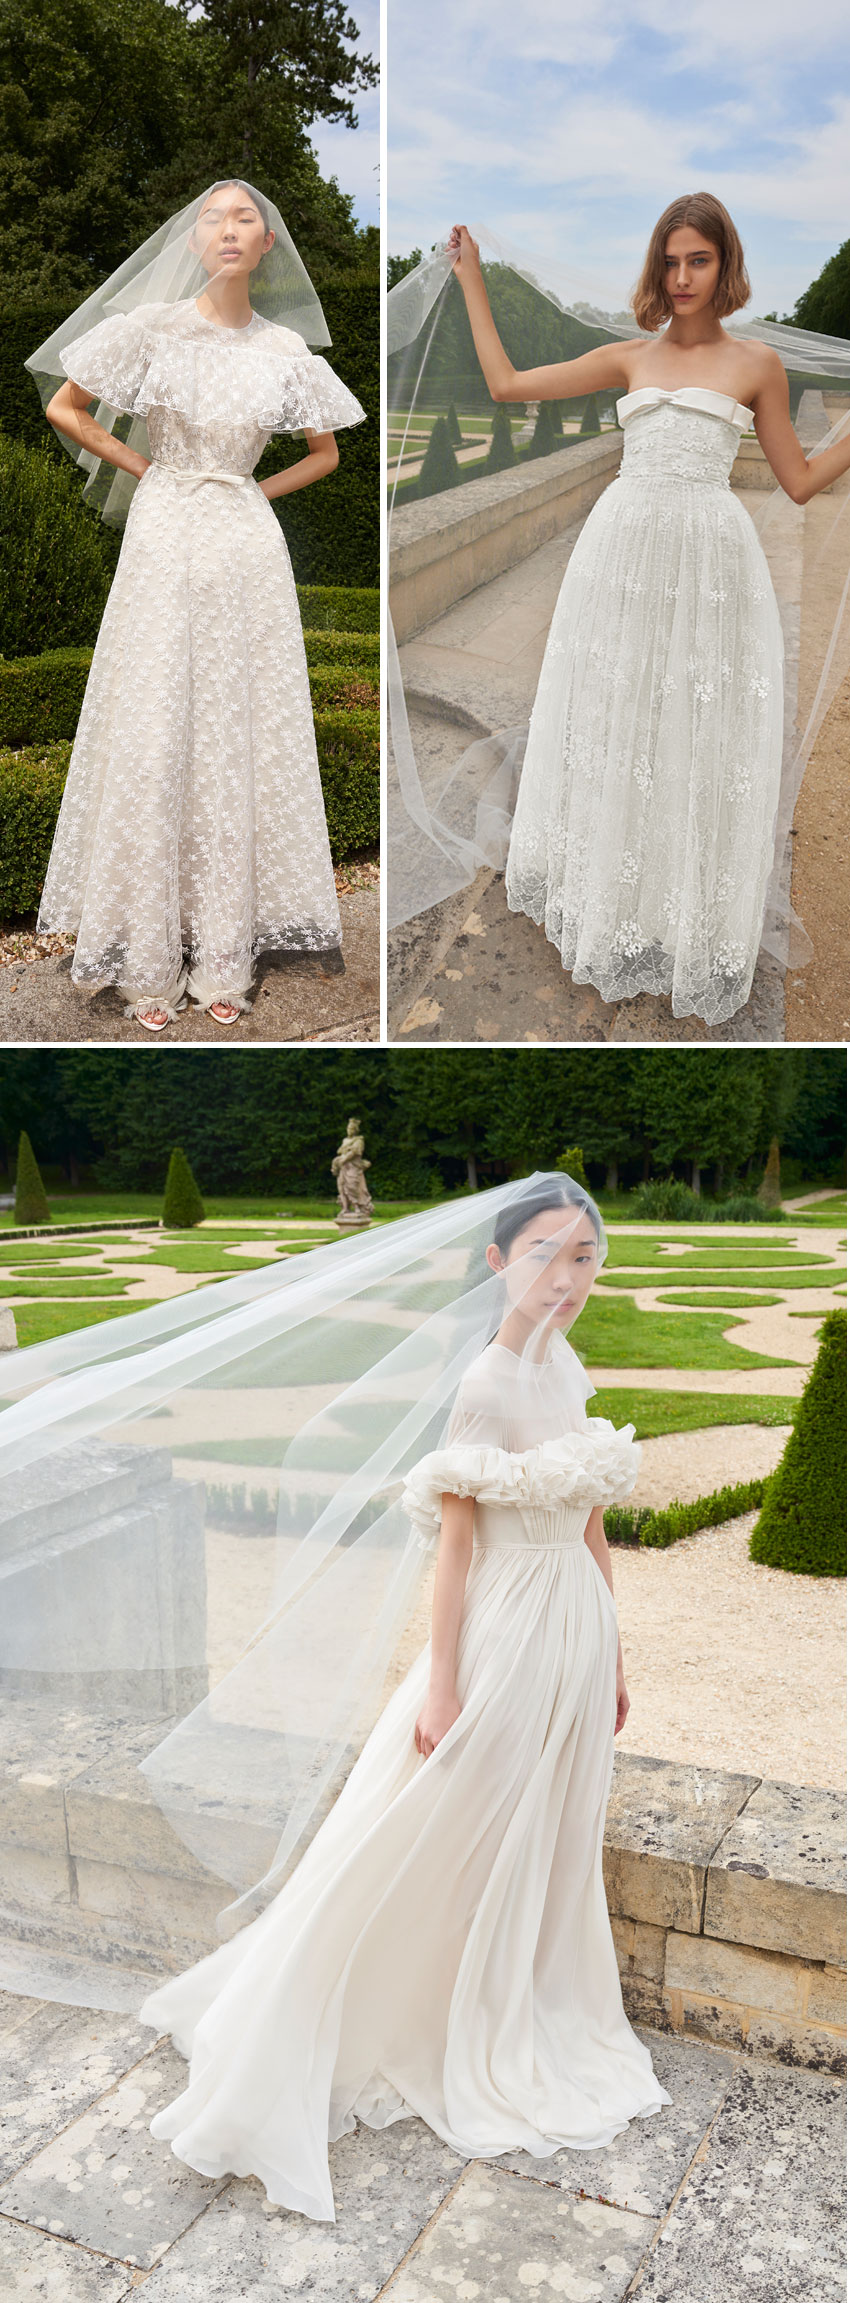 Giambattista Valle The Love collection a bridal capsule